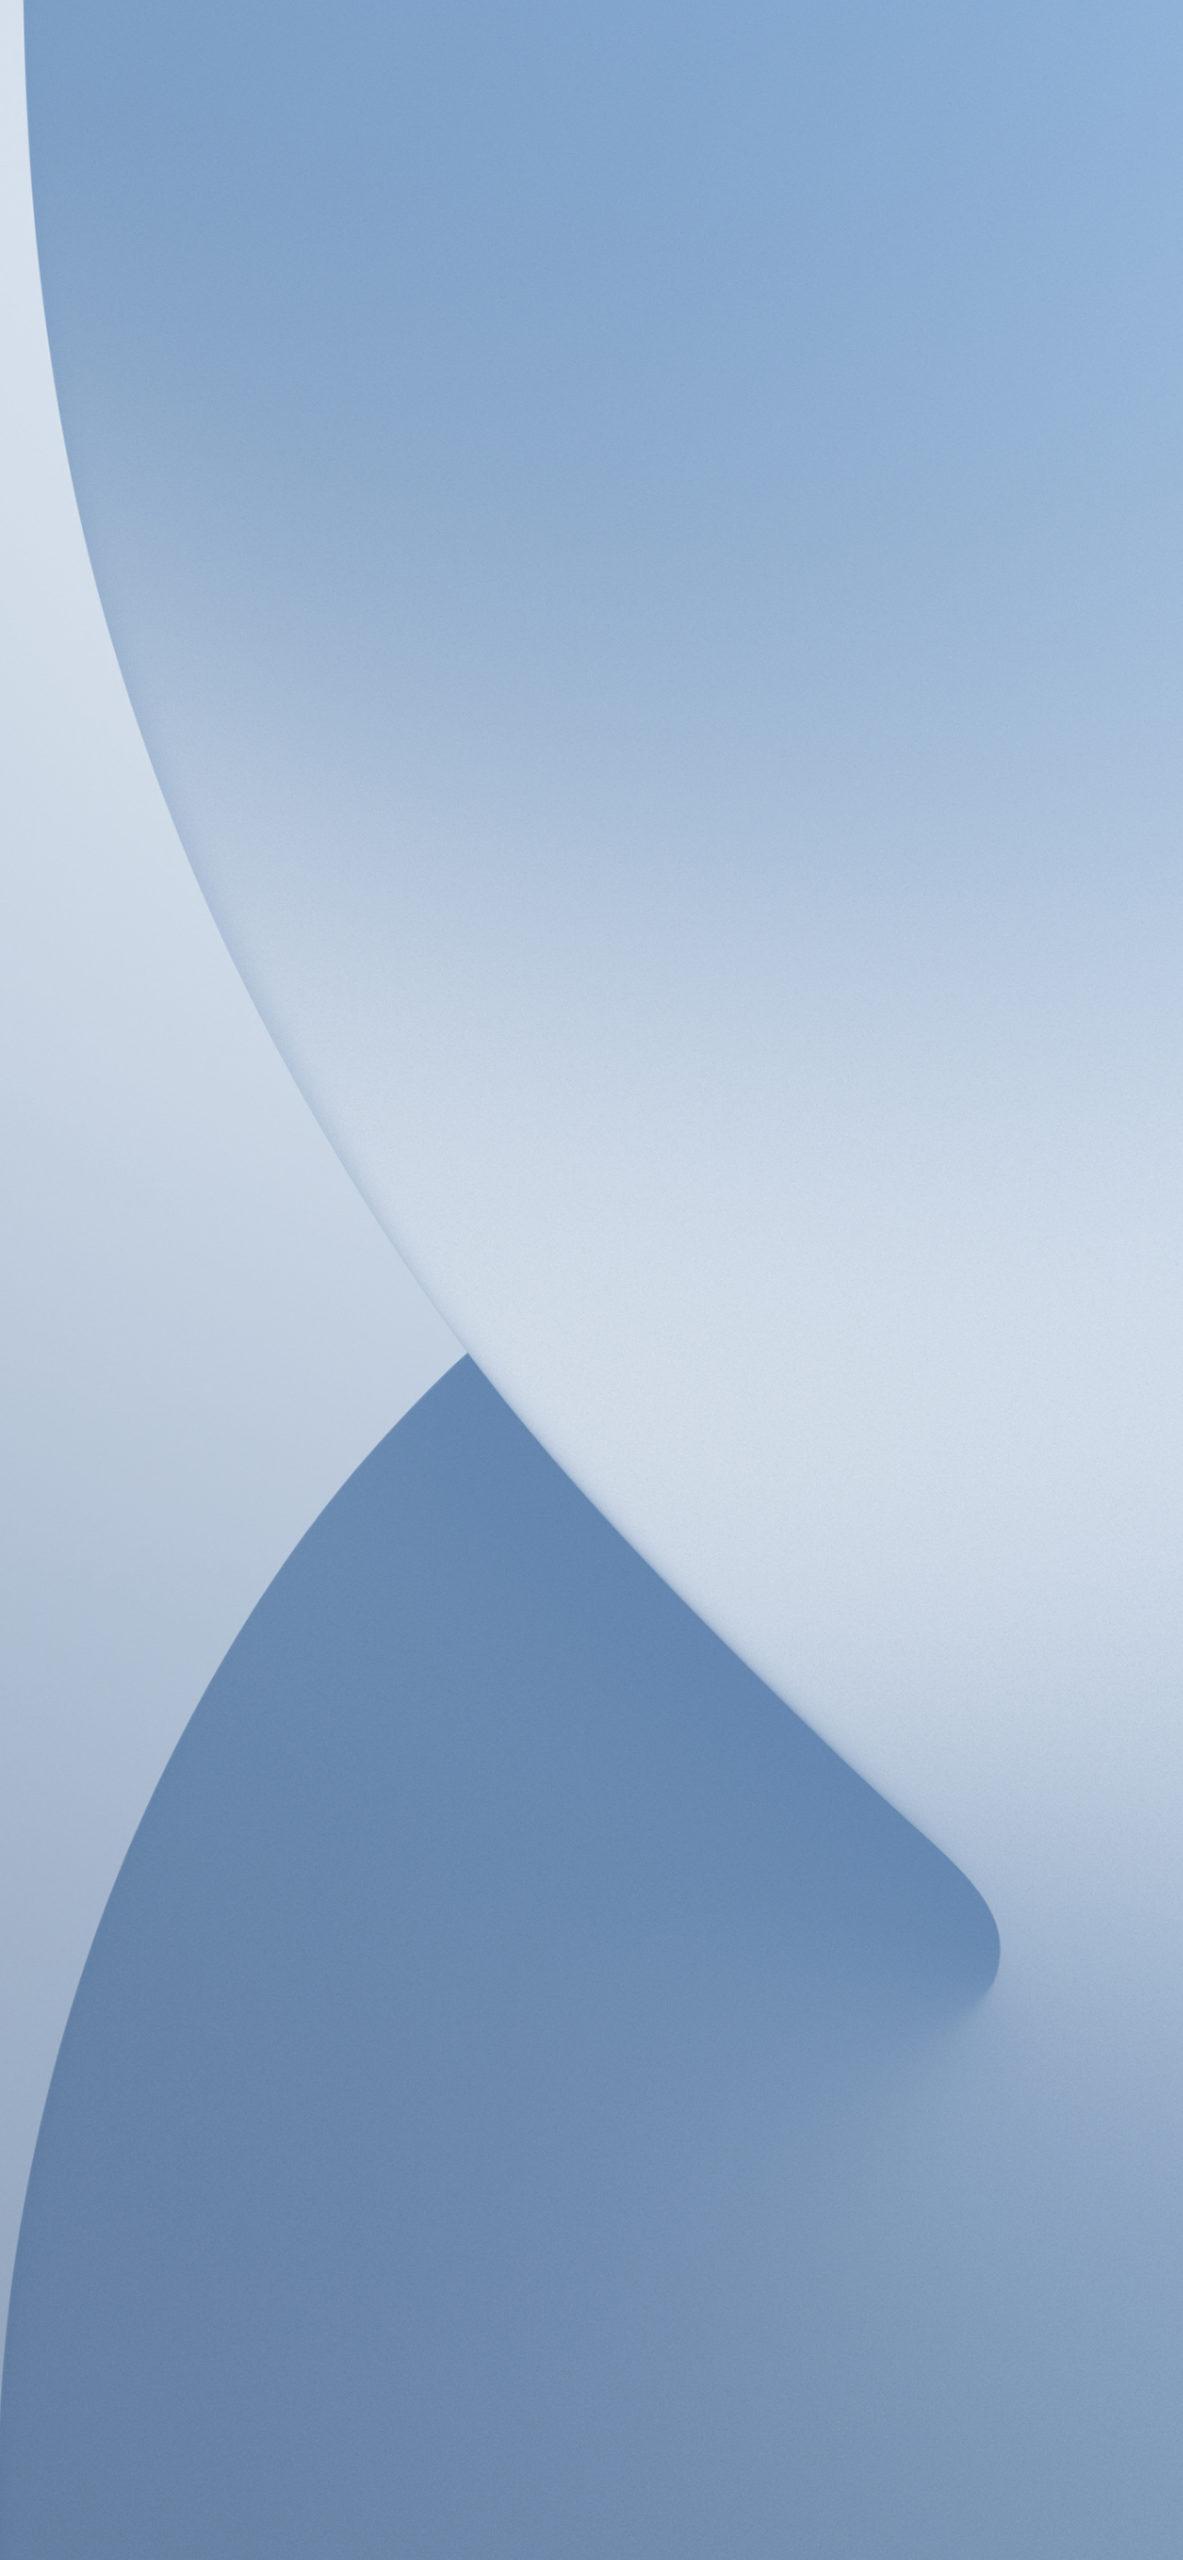 iPhone 13 Pro sierra blue inspired iOS 14 wallpaper AR72014